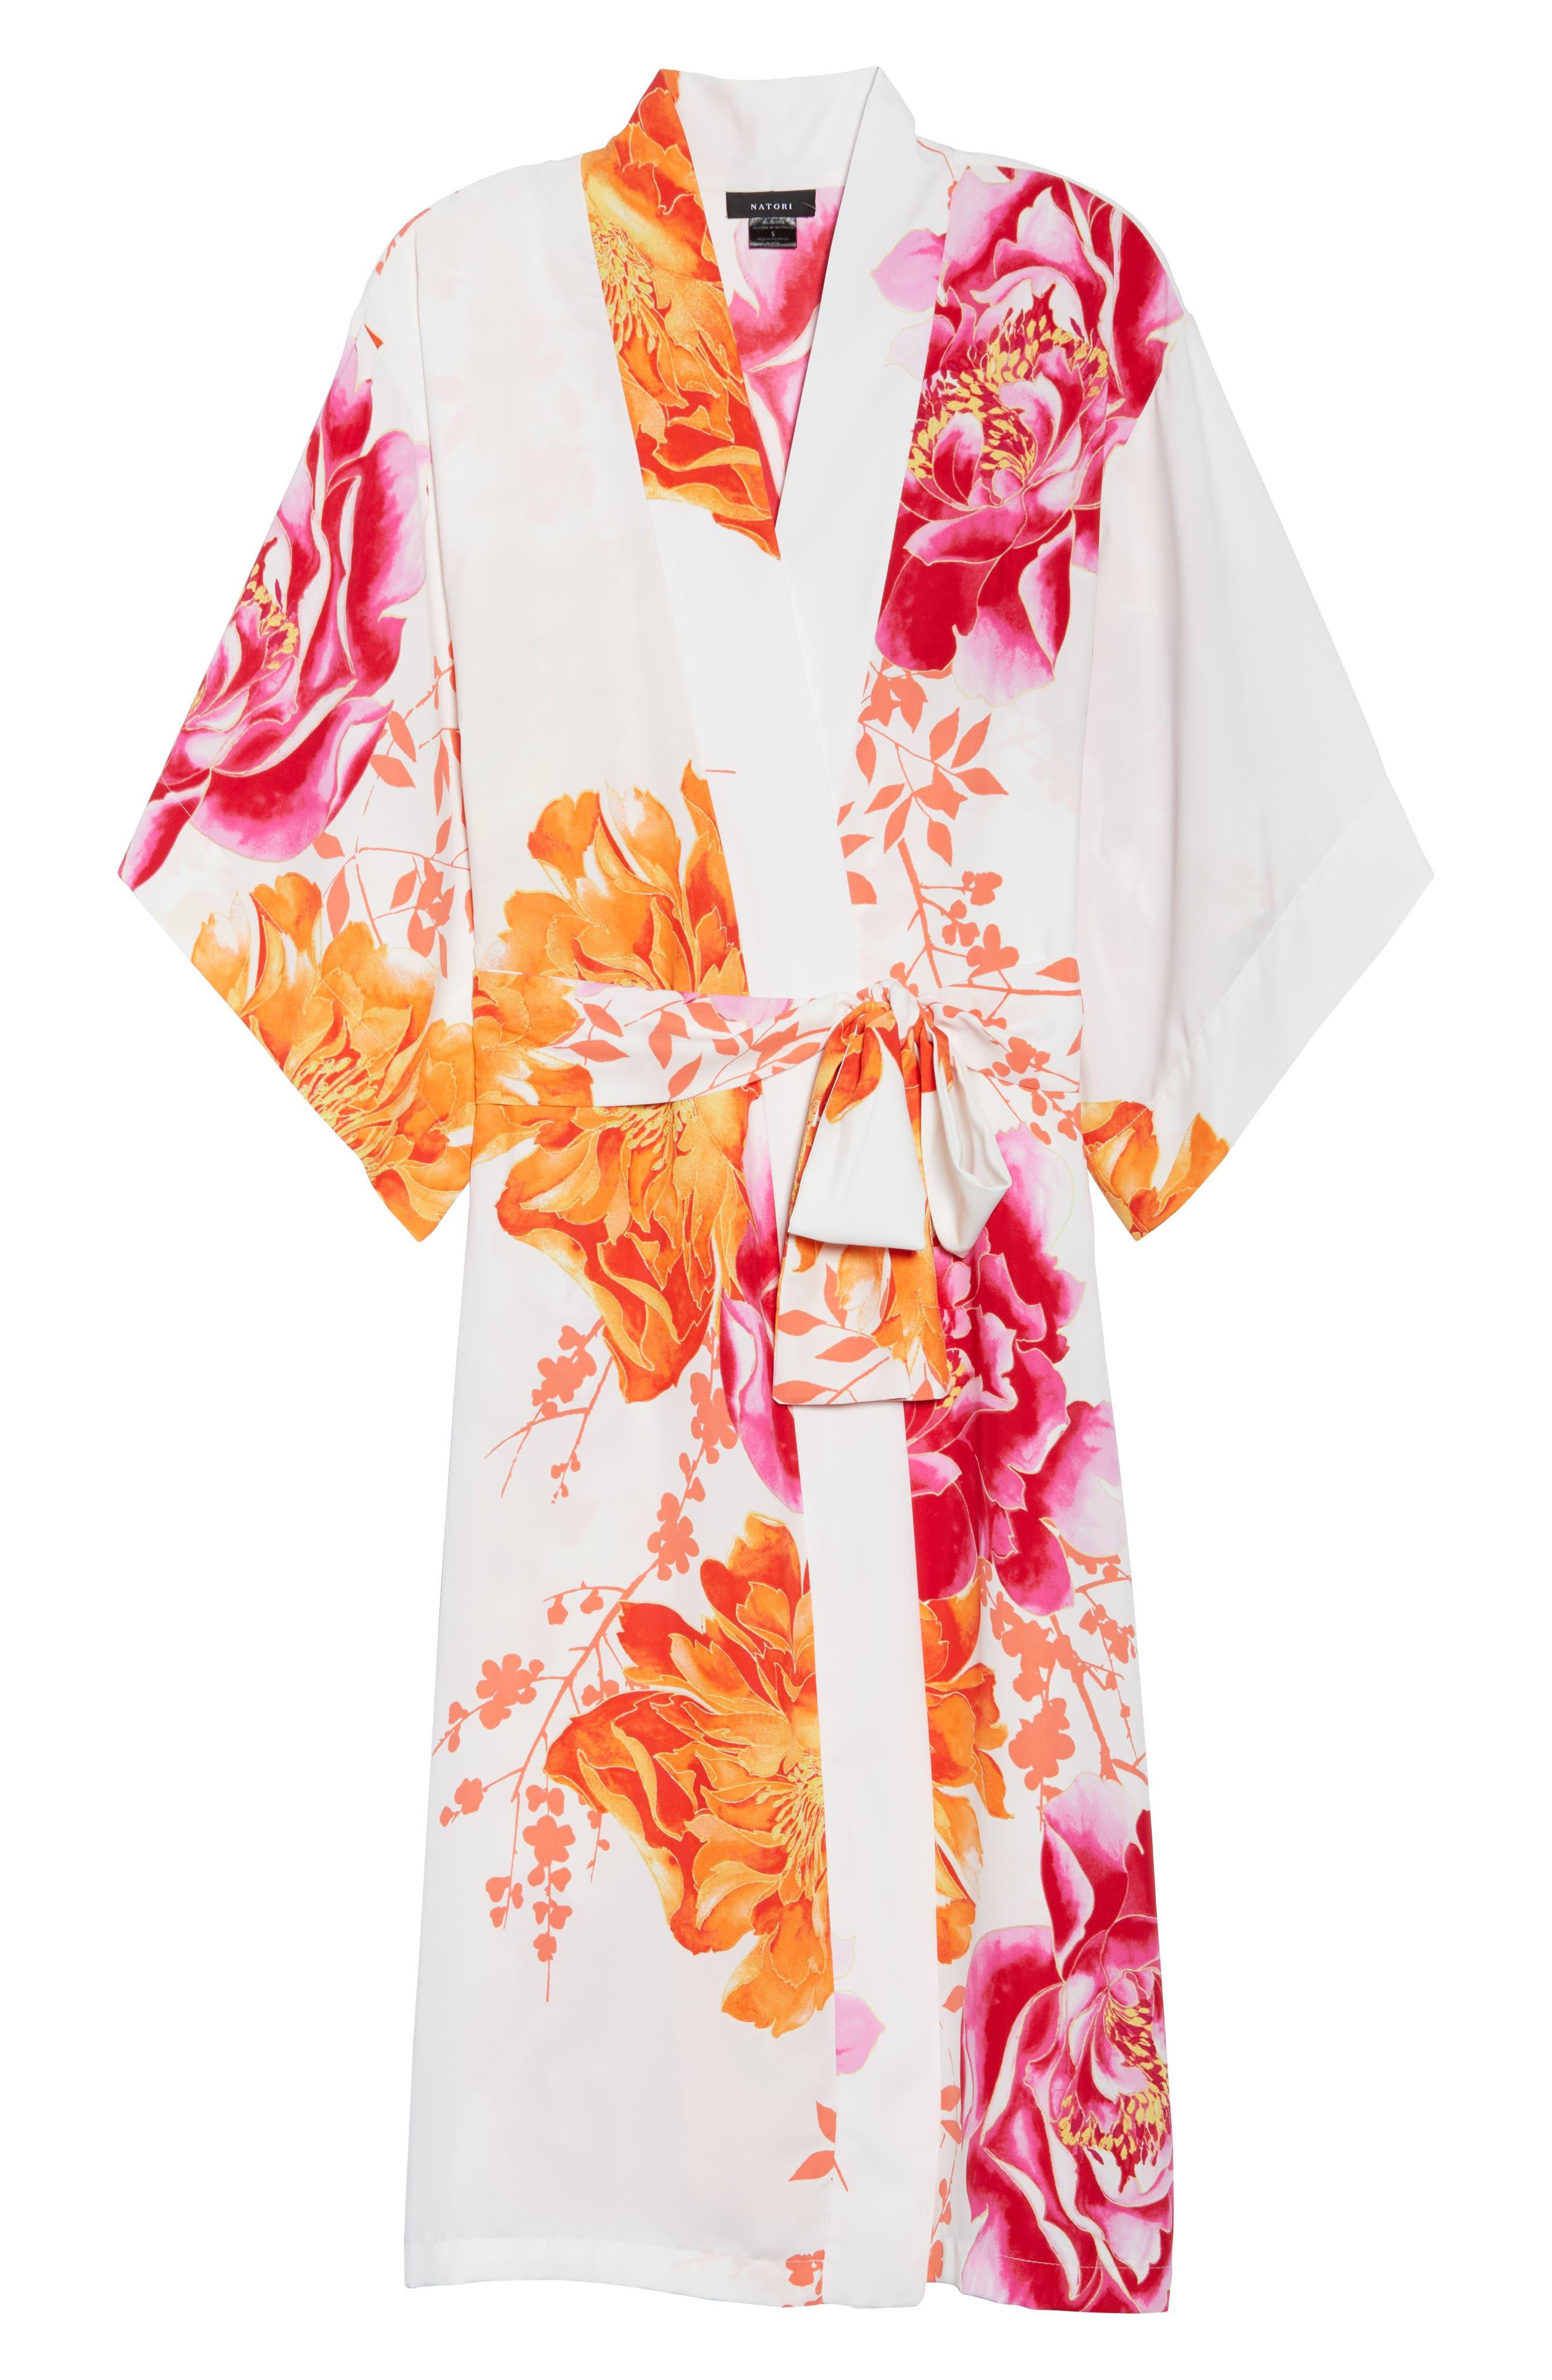 Bali Floral Print Robe,                             Alternate thumbnail 6, color,                             106